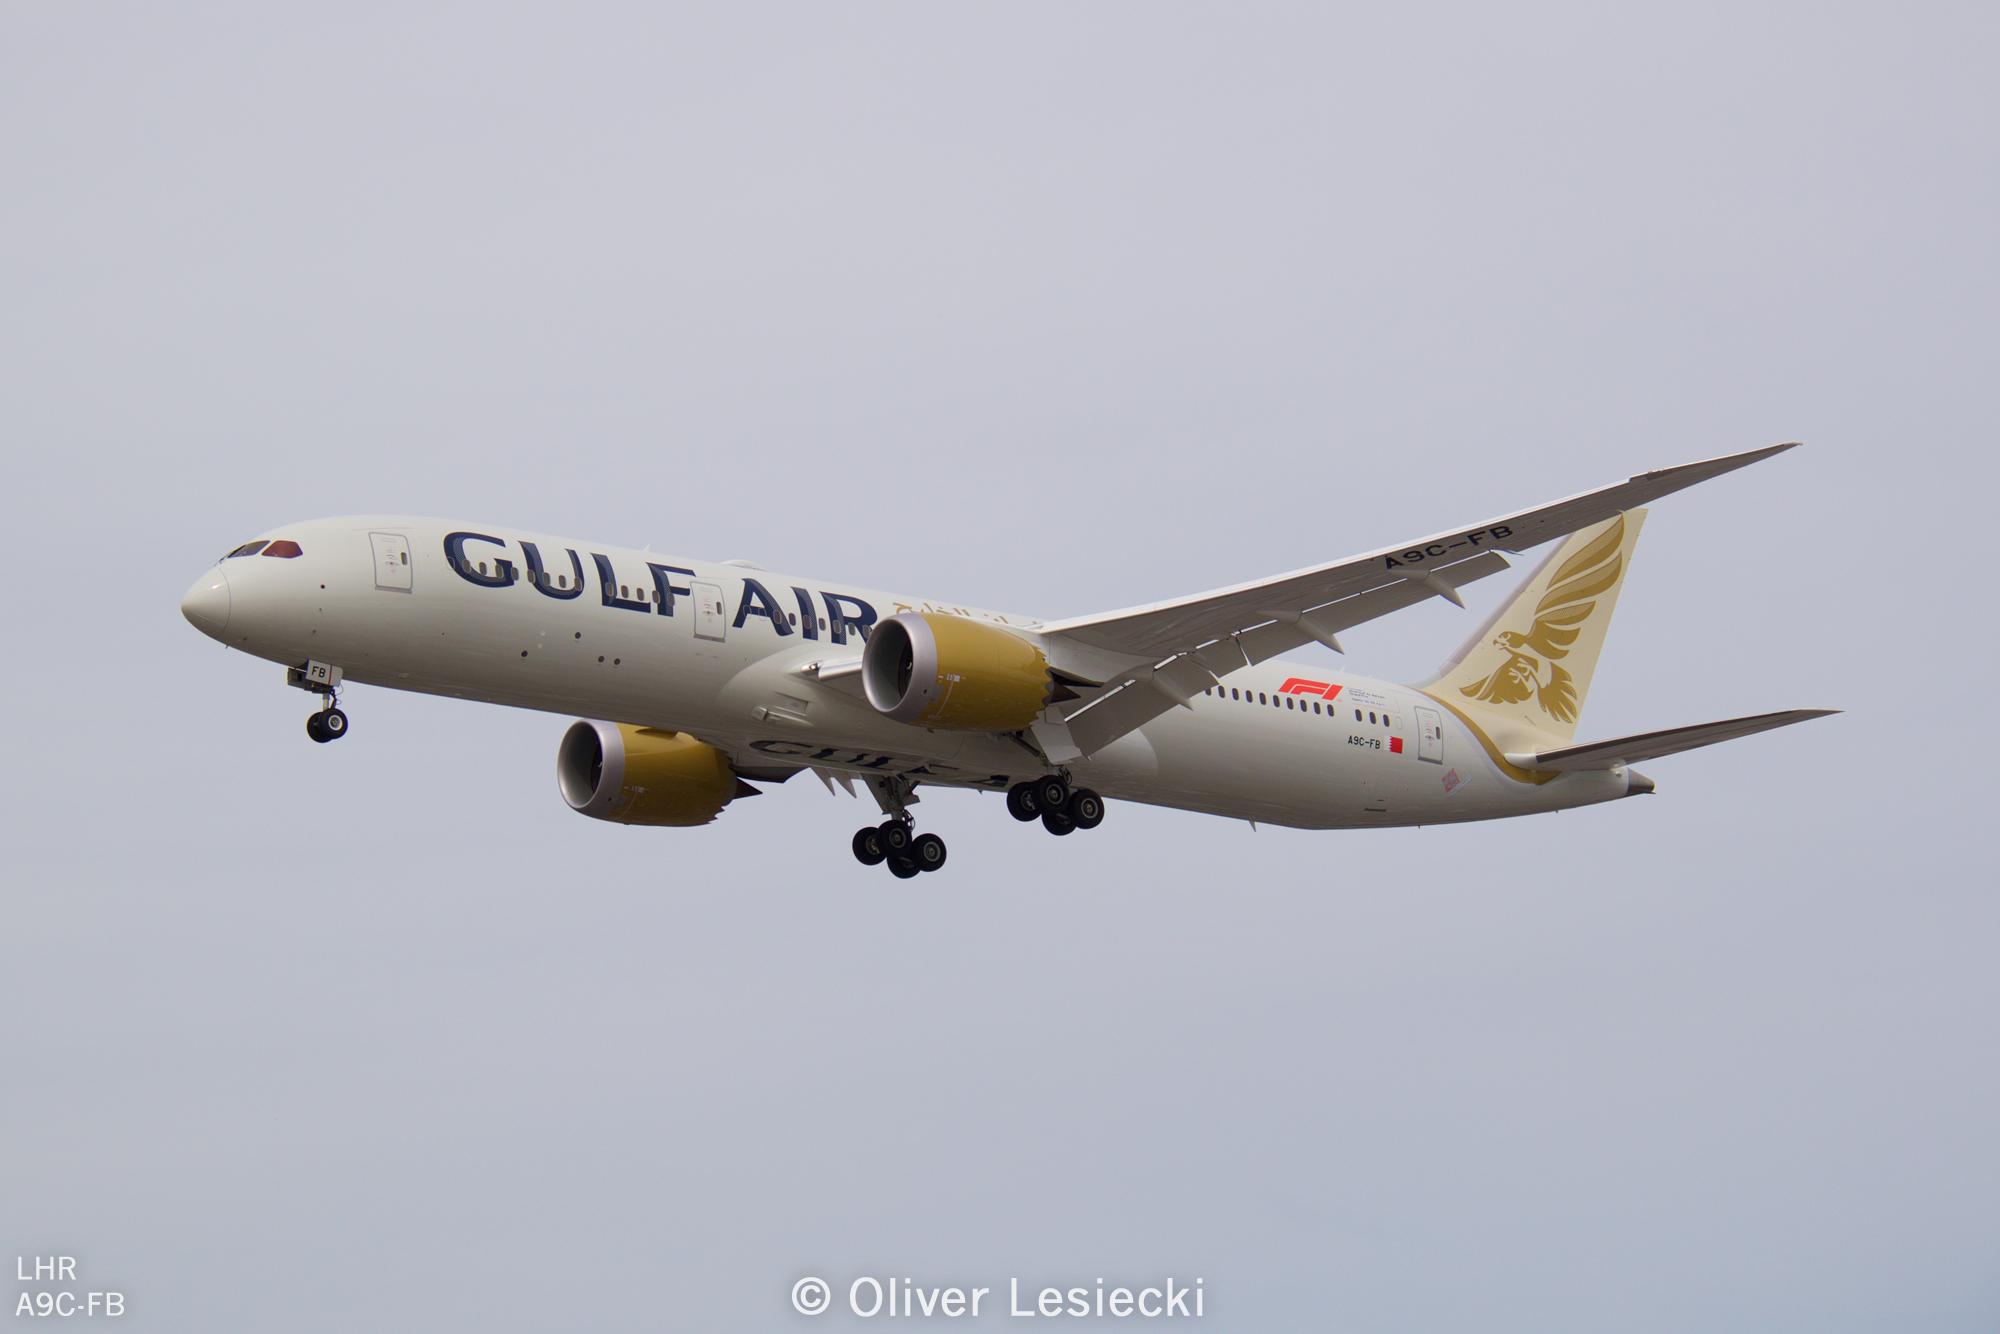 X_Gulfair_B787_A9CFB_02_LHR_230618_IG7